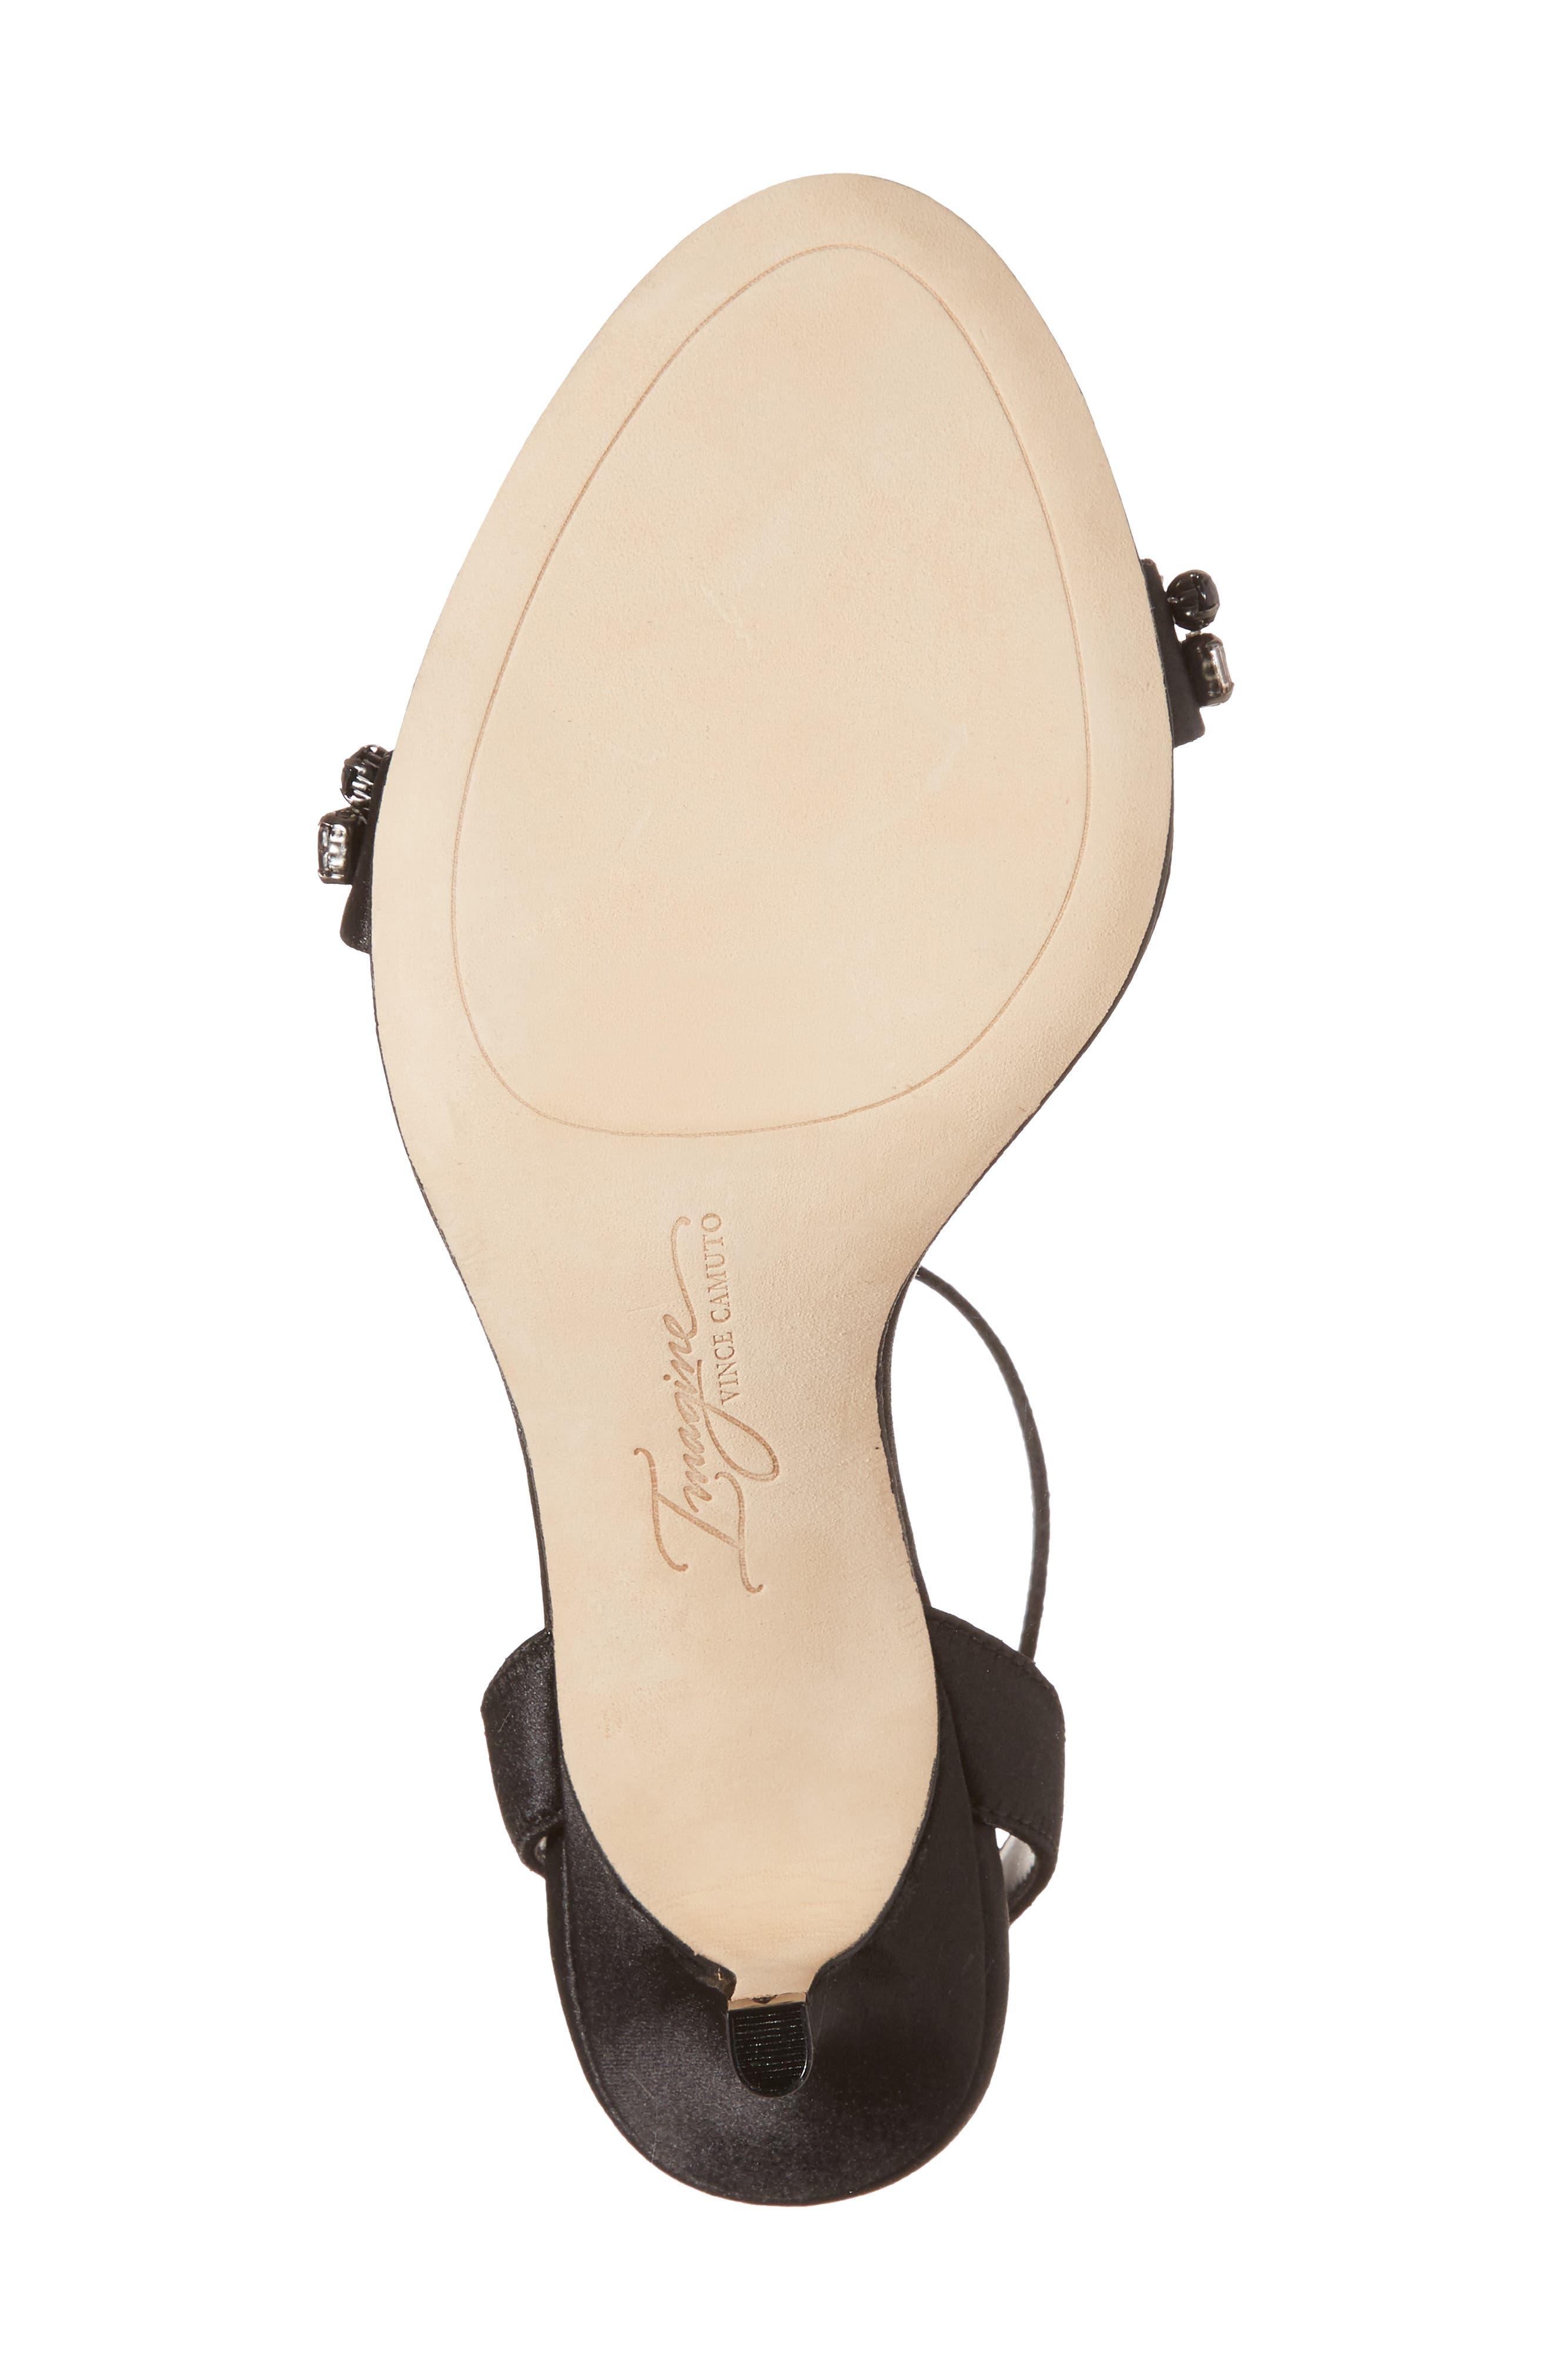 Imagine Vince Camuto Kolo Embellished Kitten Heel Sandal,                             Alternate thumbnail 6, color,                             001